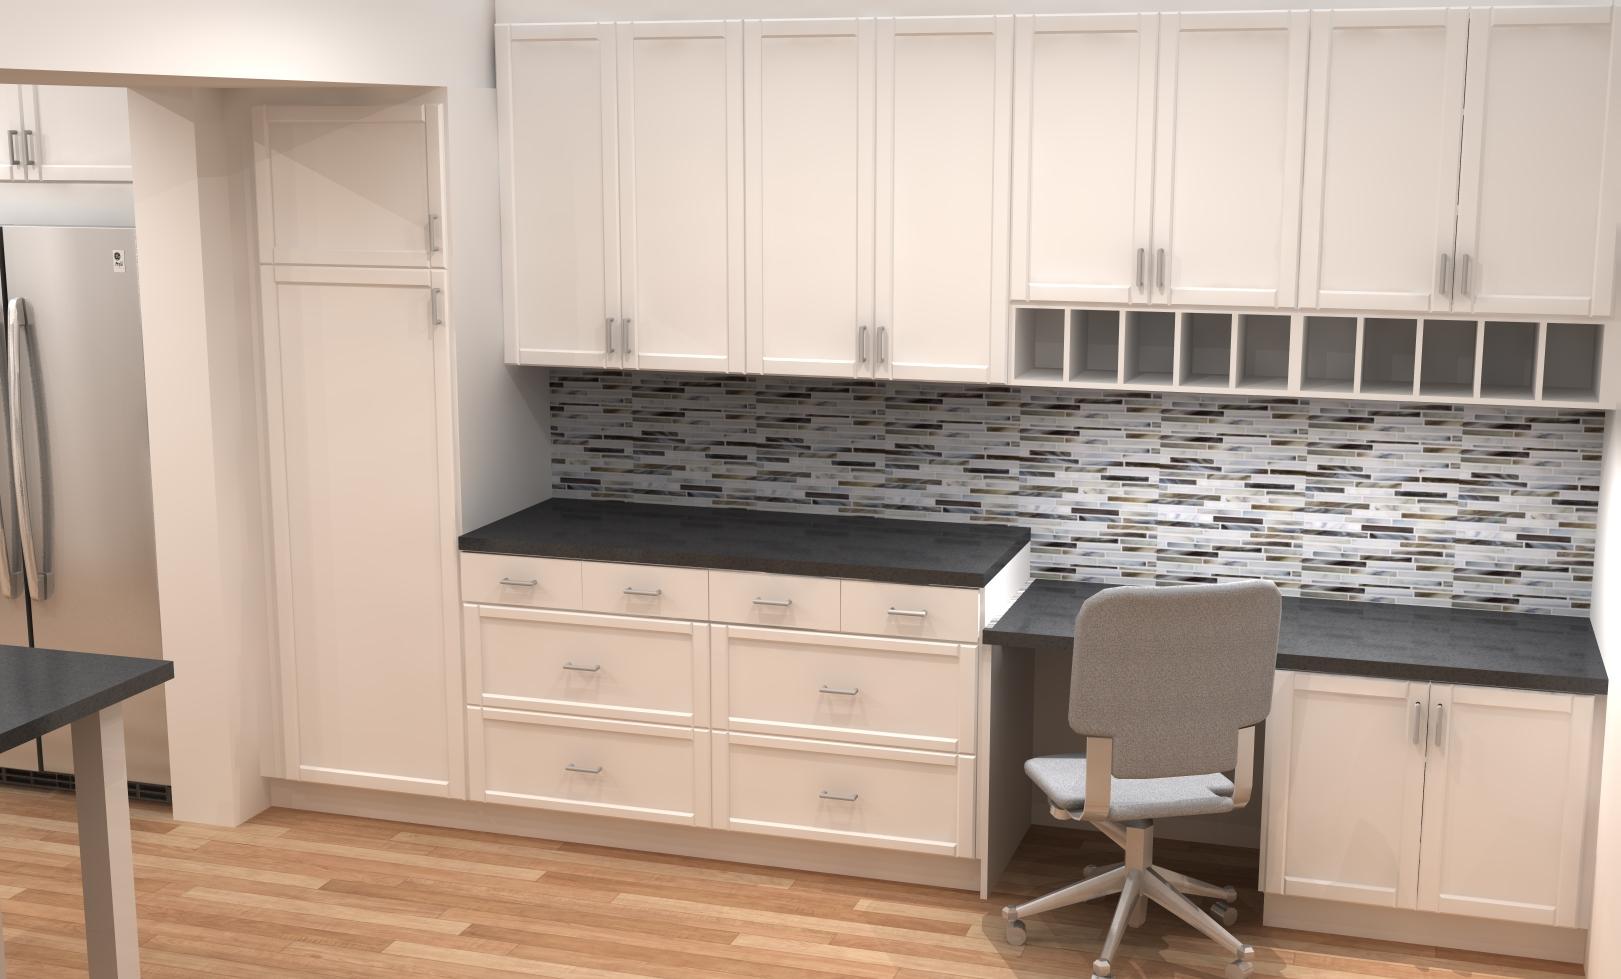 Best Kitchen Gallery: Small Kitchen Remodel With Ikea Cabi S of Ikea Kitchen Storage Cabinet Oak on rachelxblog.com